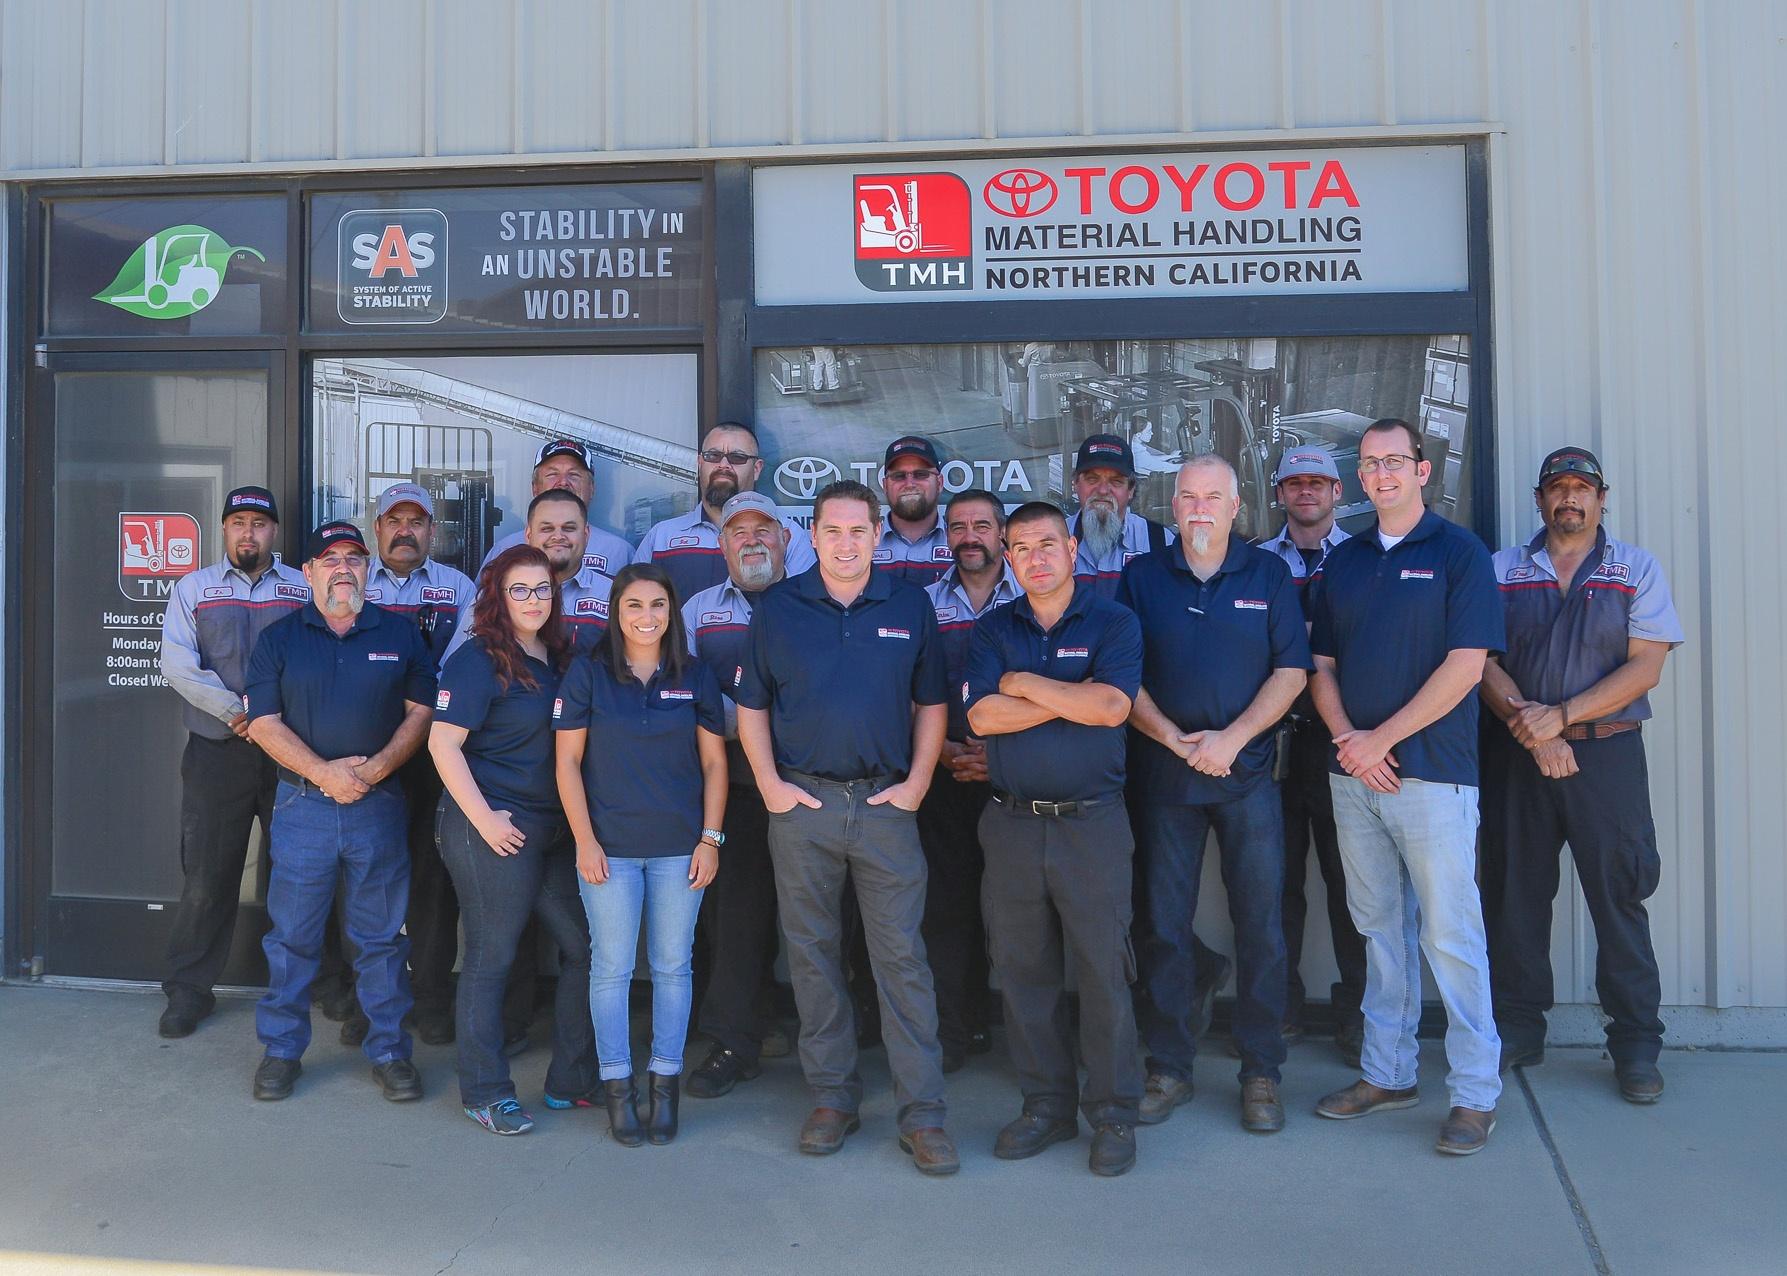 Toyota_Forklifts_in_Salinas.jpg